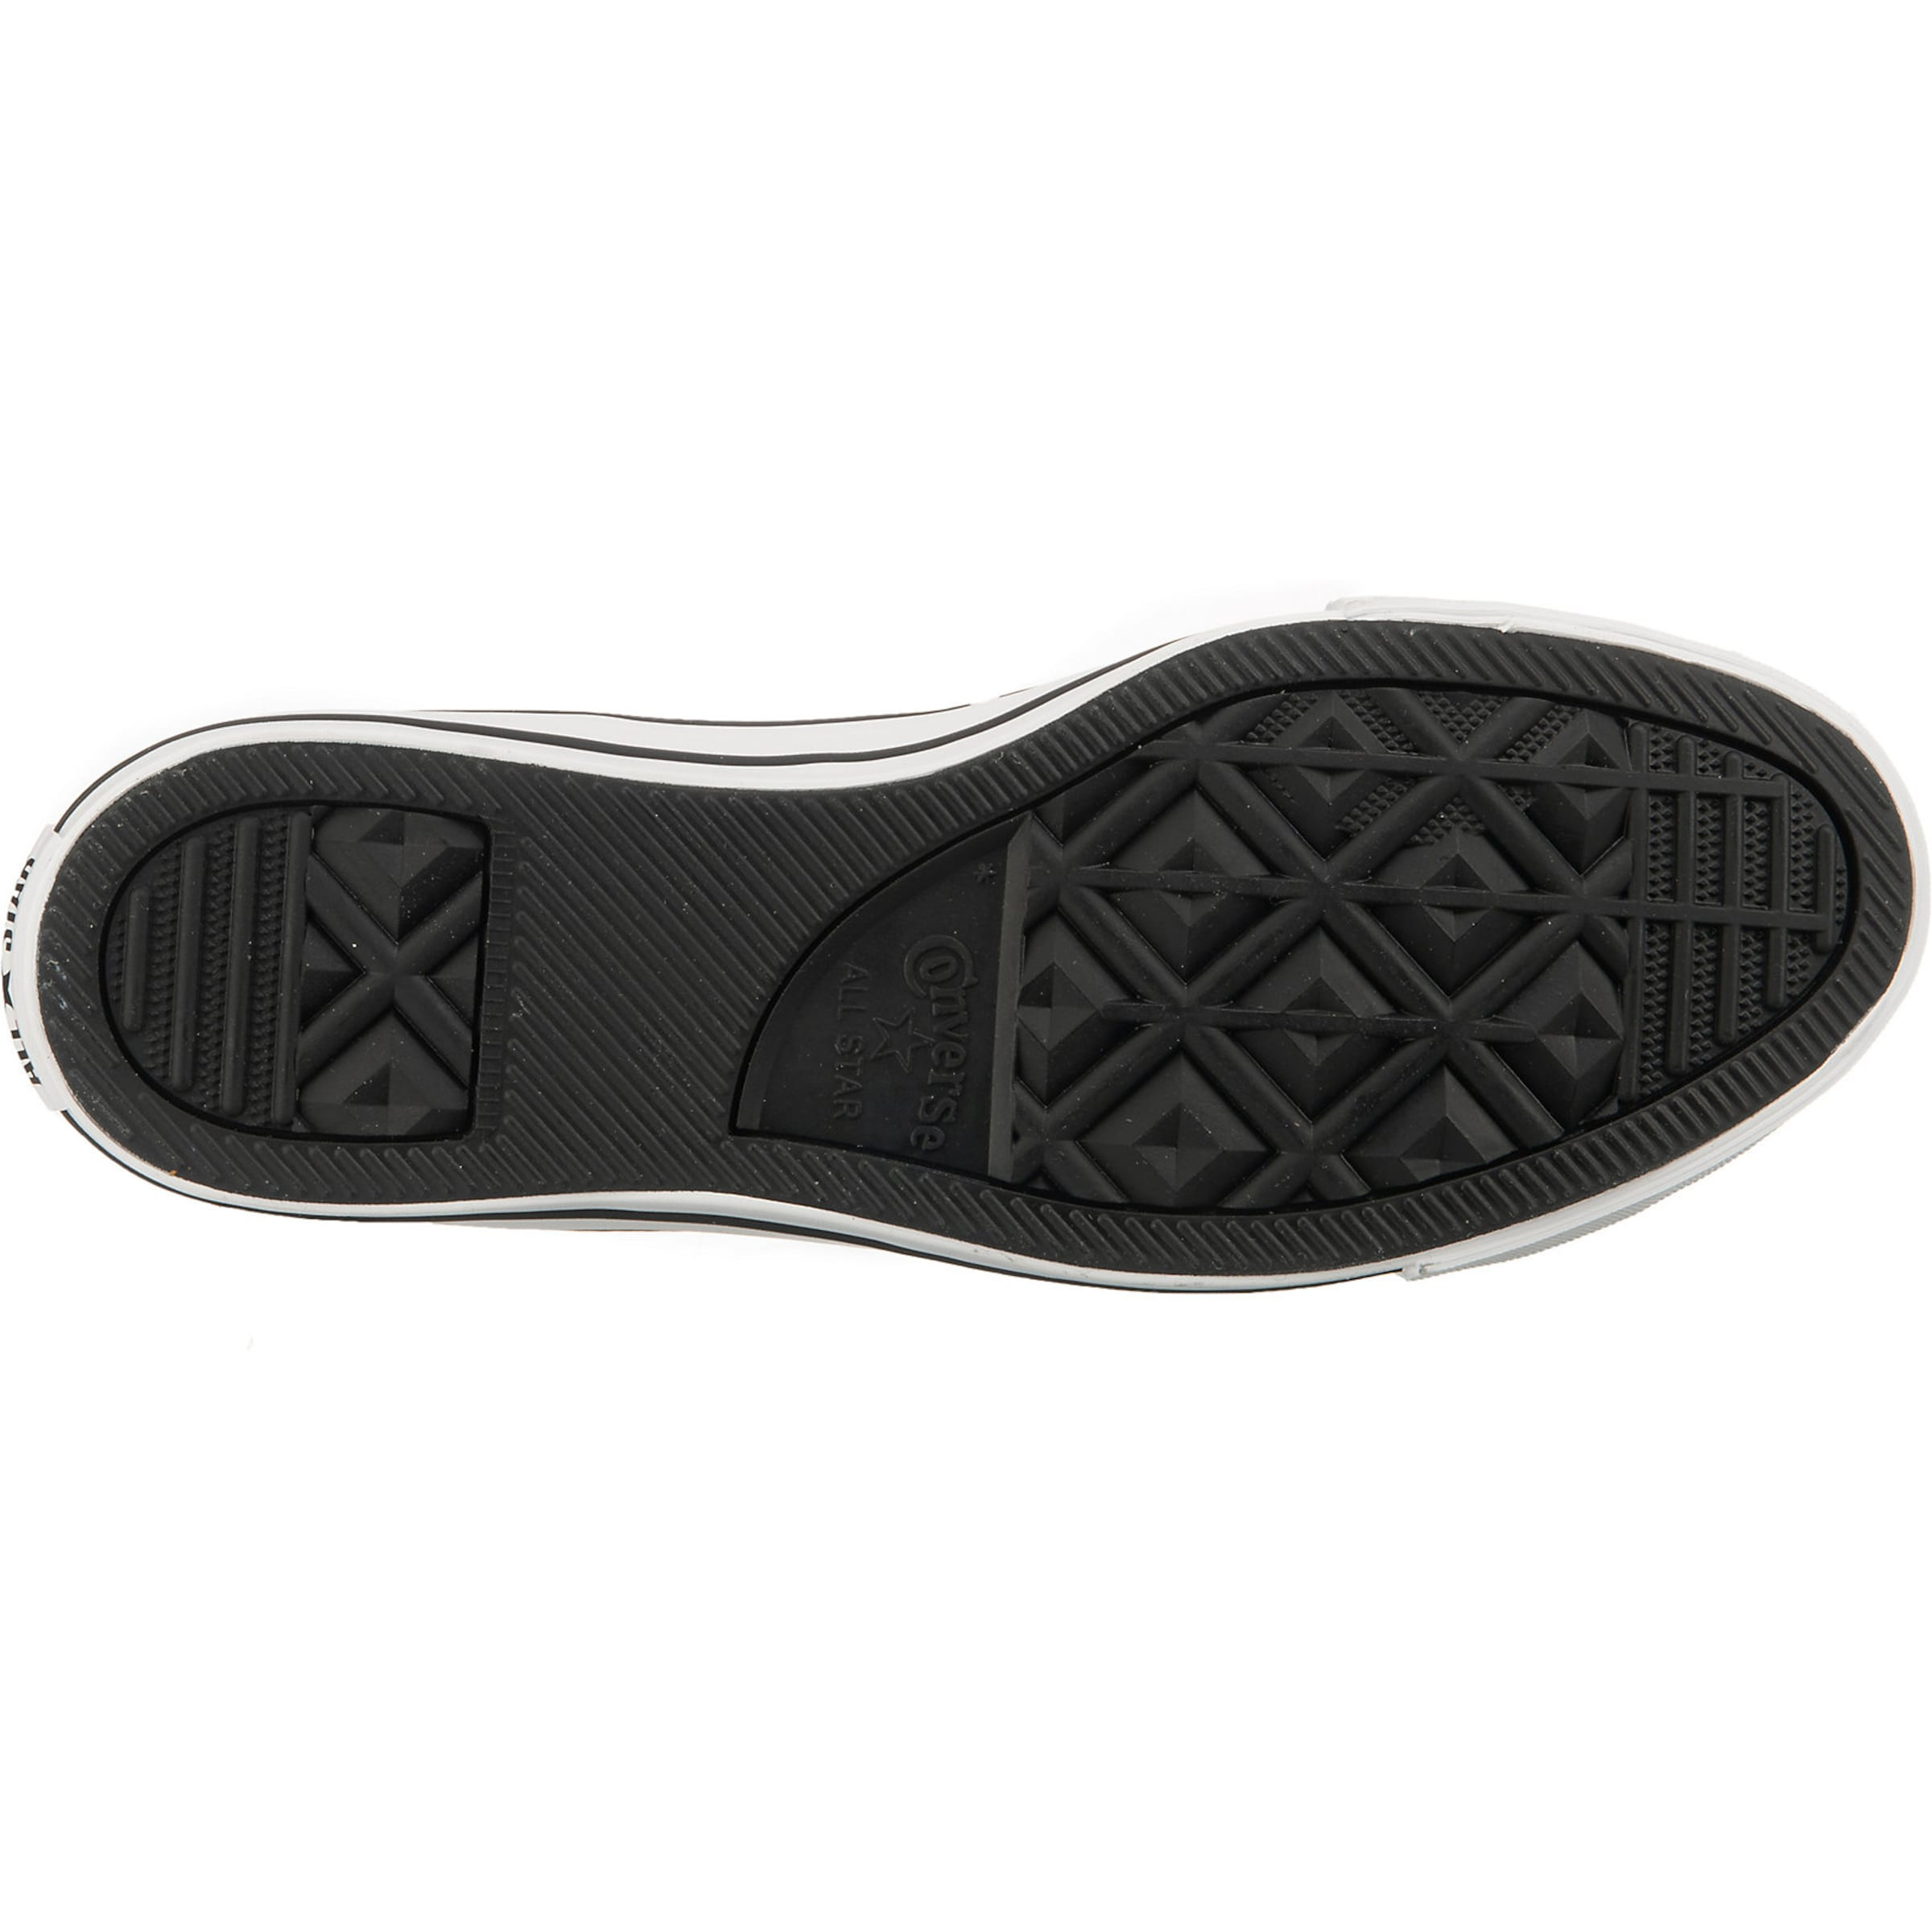 CONVERSE Sneaker 'Chuck Taylor All Star'